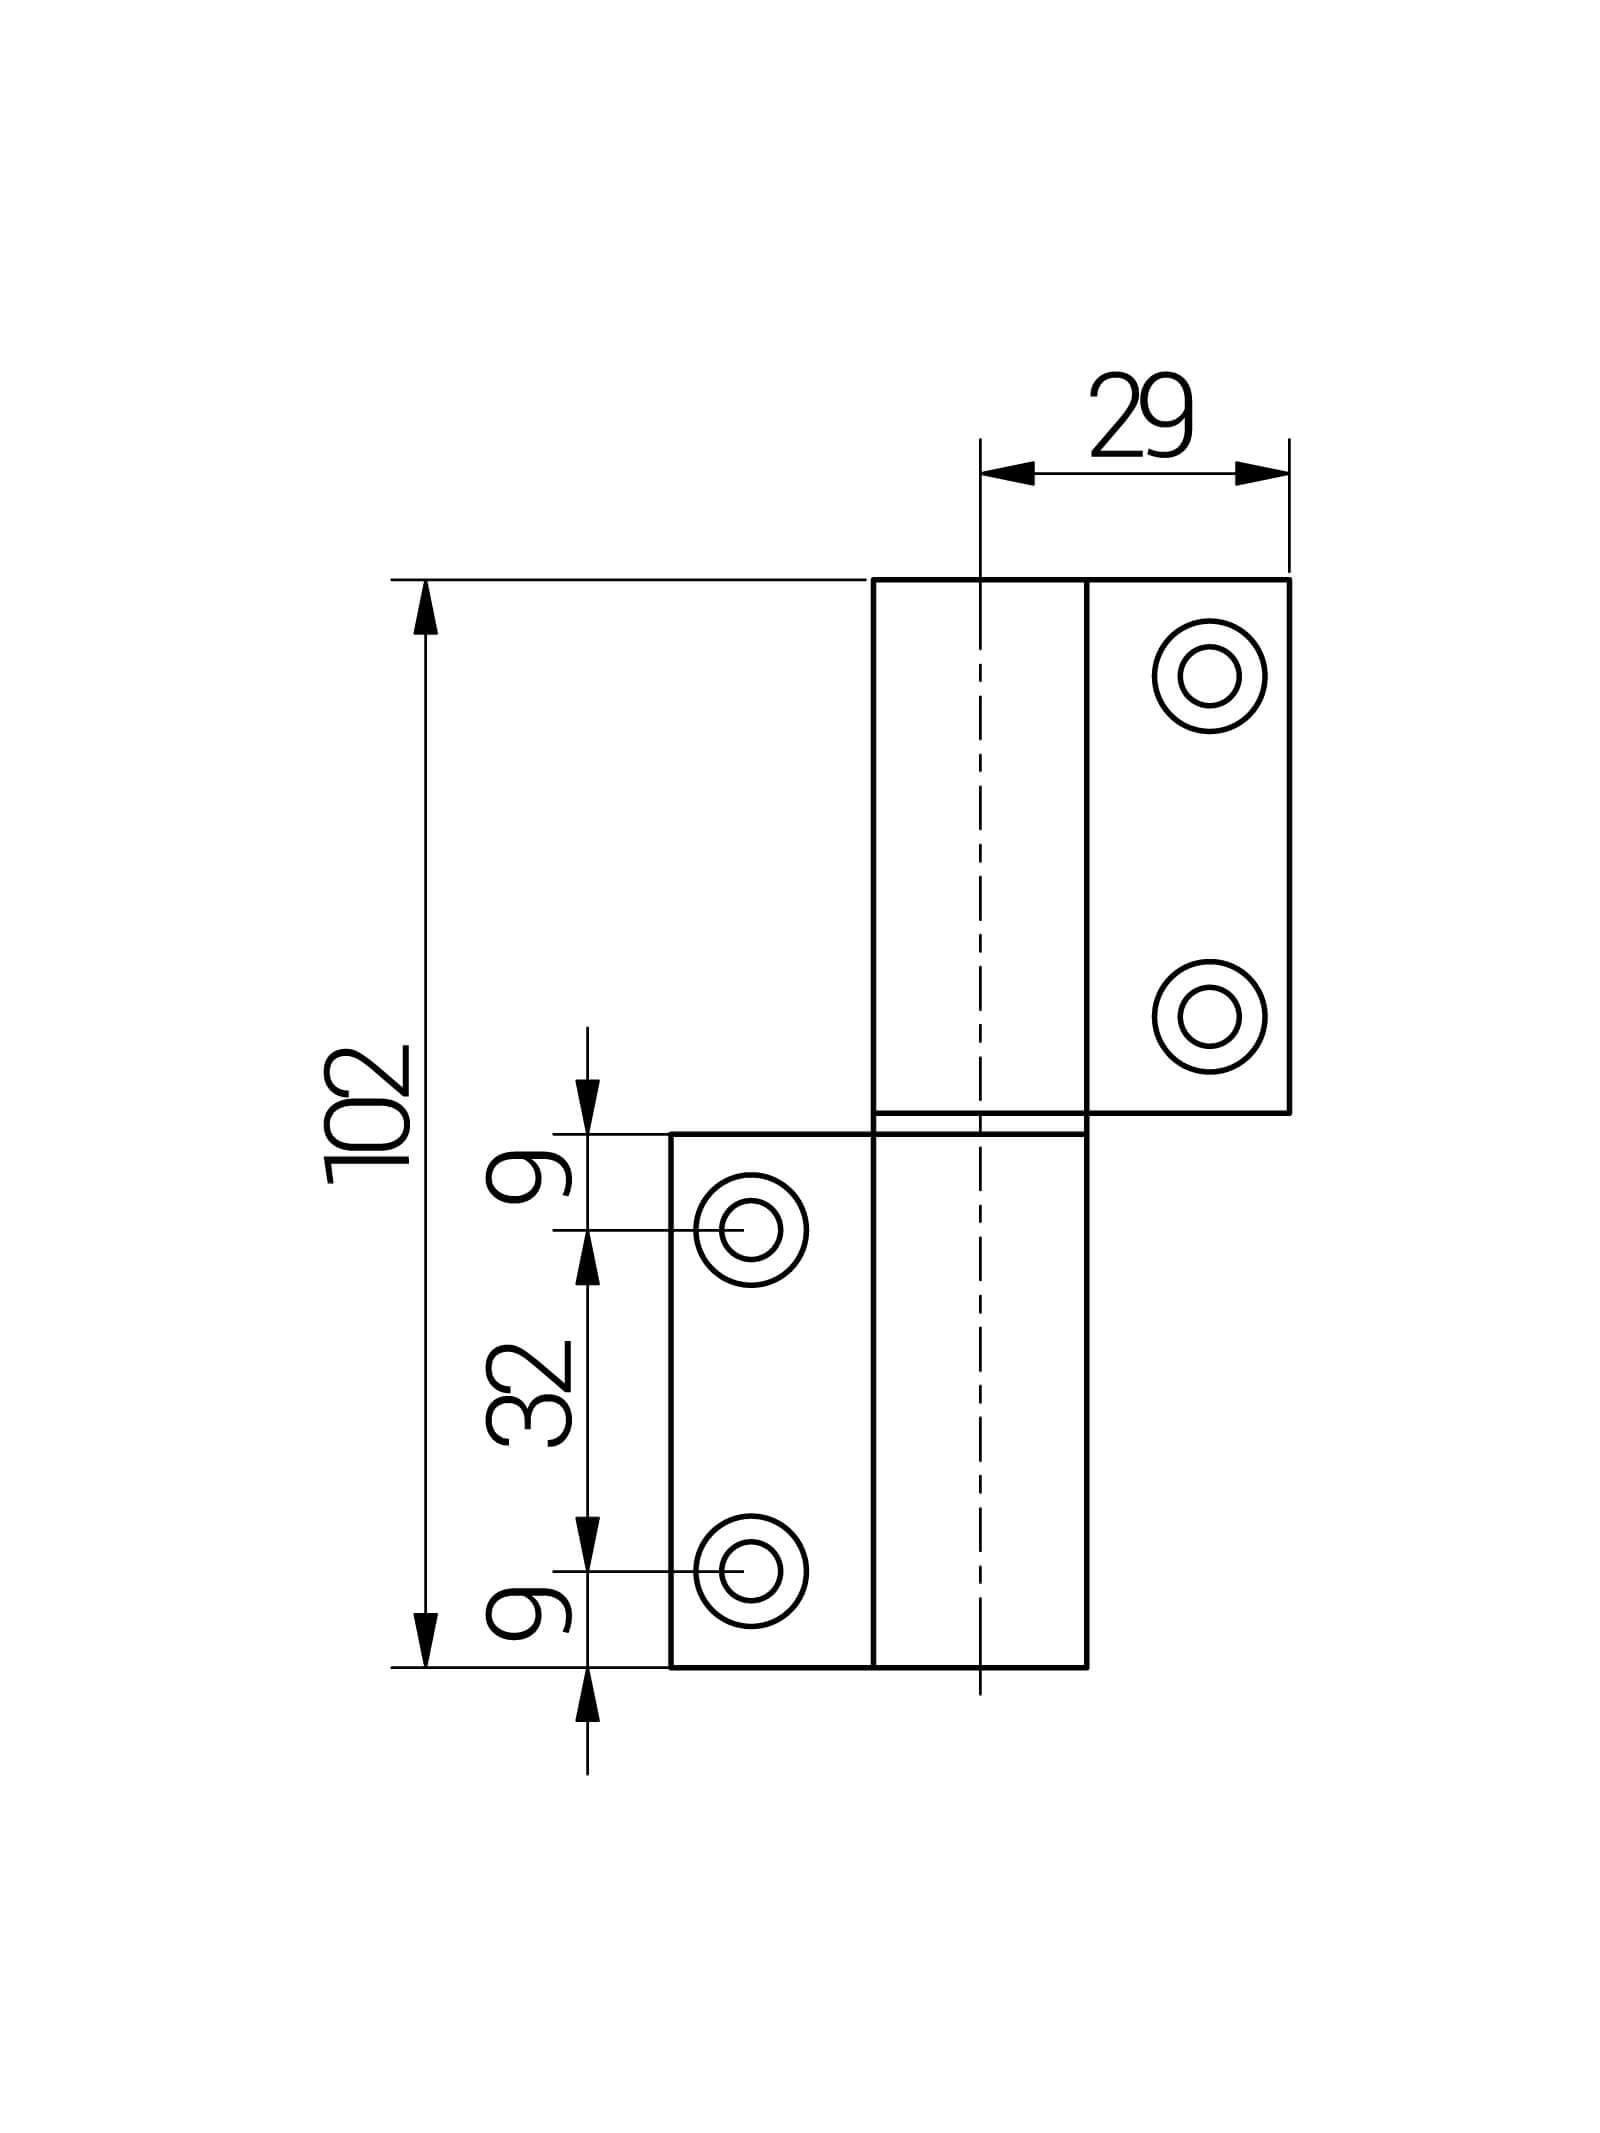 BUNT & PFIFFIG Doppelpack Möbelband Möbelscharnier Aufschraubband Türscharnier aus Aluminium Grau Achatgrau Hellgrau RAL 7038 DIN-Richtung: Links - aufschraubbar-2